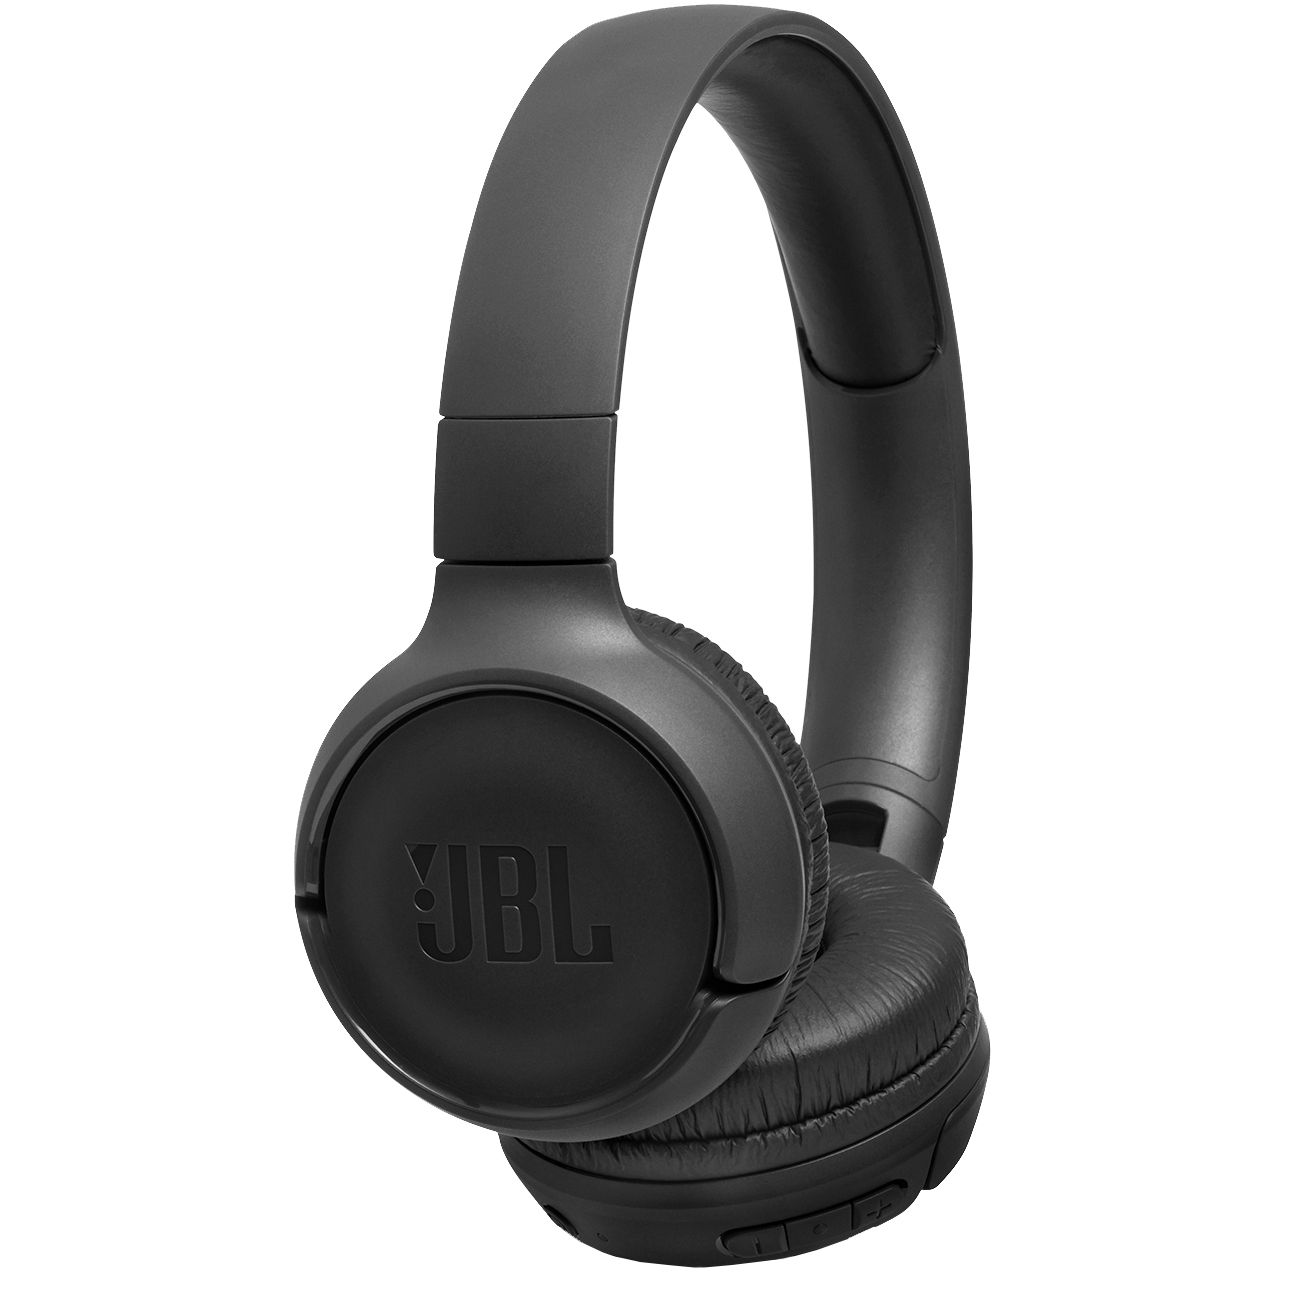 Casti audio On-Ear JBL Tune 500BT, Wireless, Bluetooth, Pure Bass Sound, Hands-free Call, 16H, Black